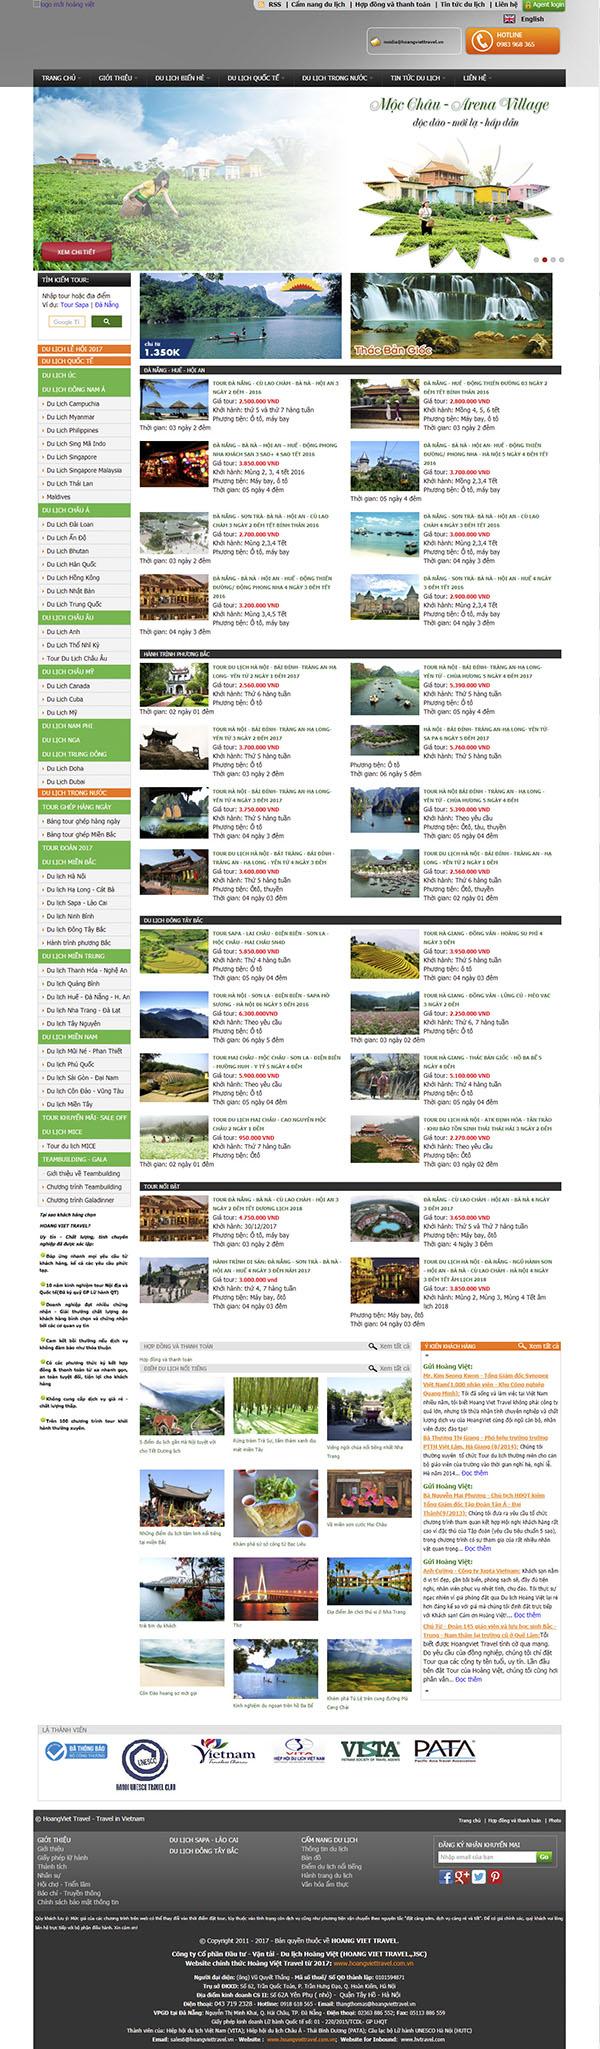 Thiết kế Mẫu website du lịch Dl04